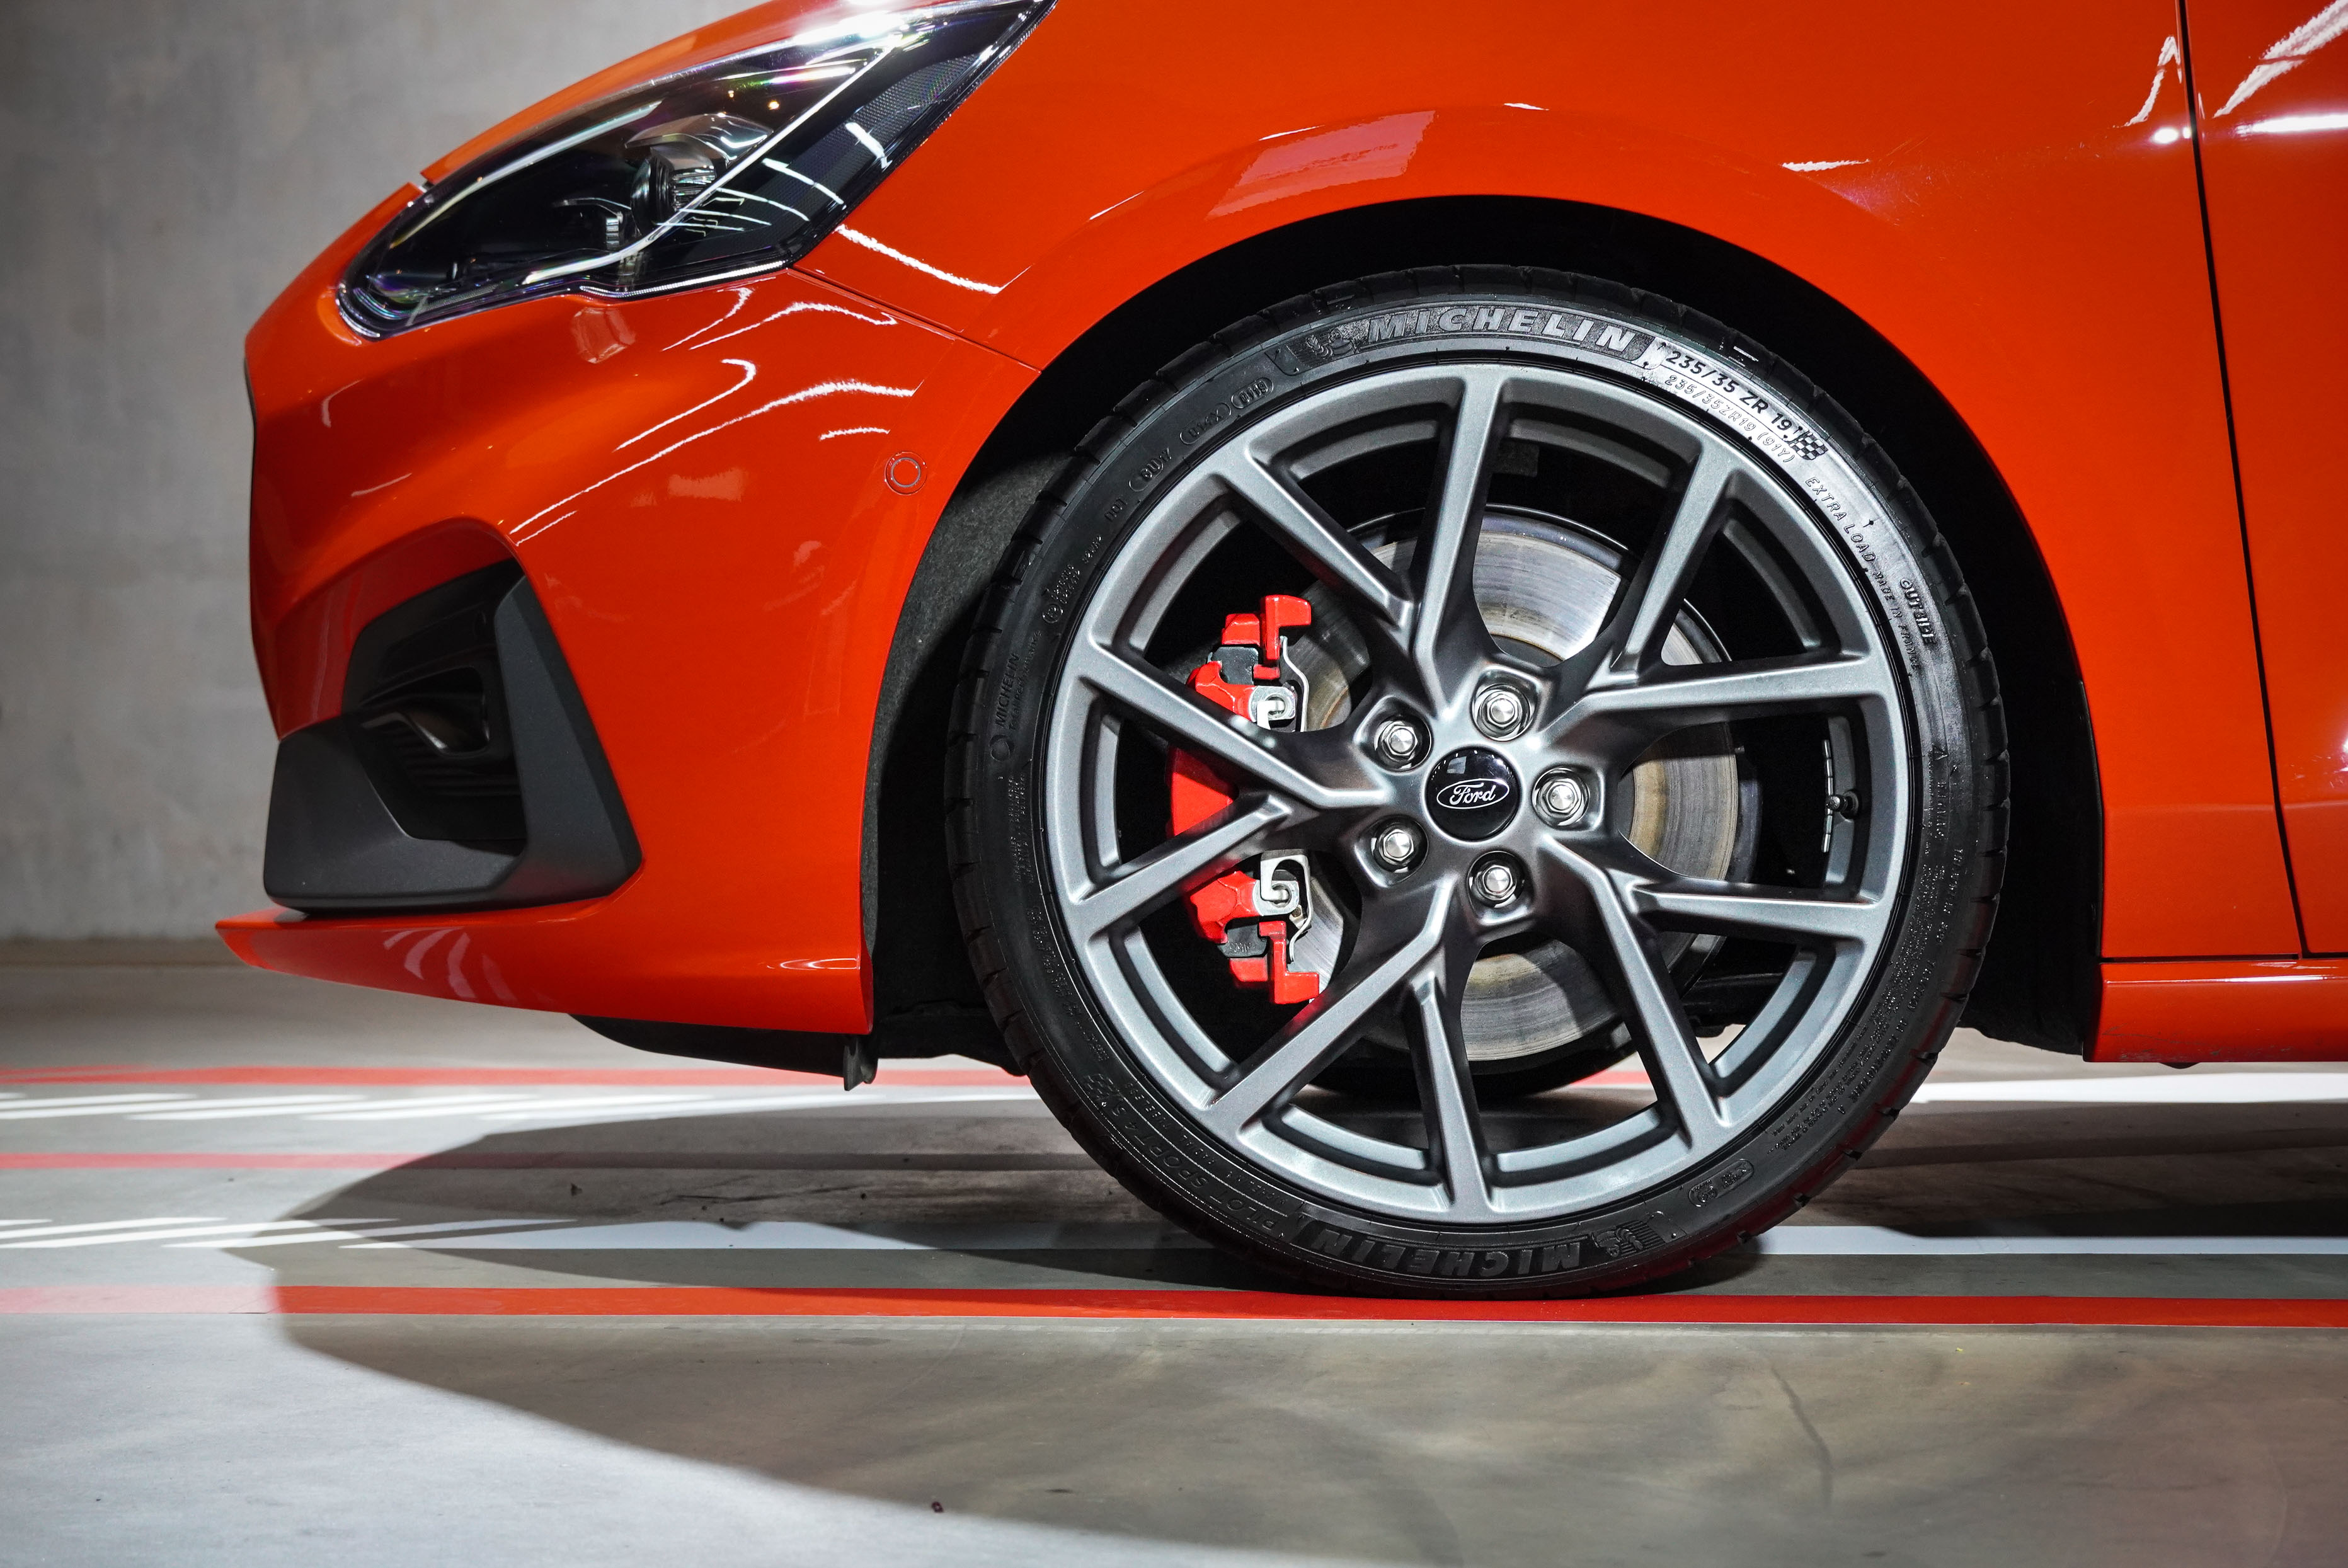 Ford Focus ST Wagon 標配 Michelin 19 吋 Pilot Sport 4 S進階高性能跑胎、輕量化鋁圈及大型紅色卡鉗(前雙後單活塞組)。